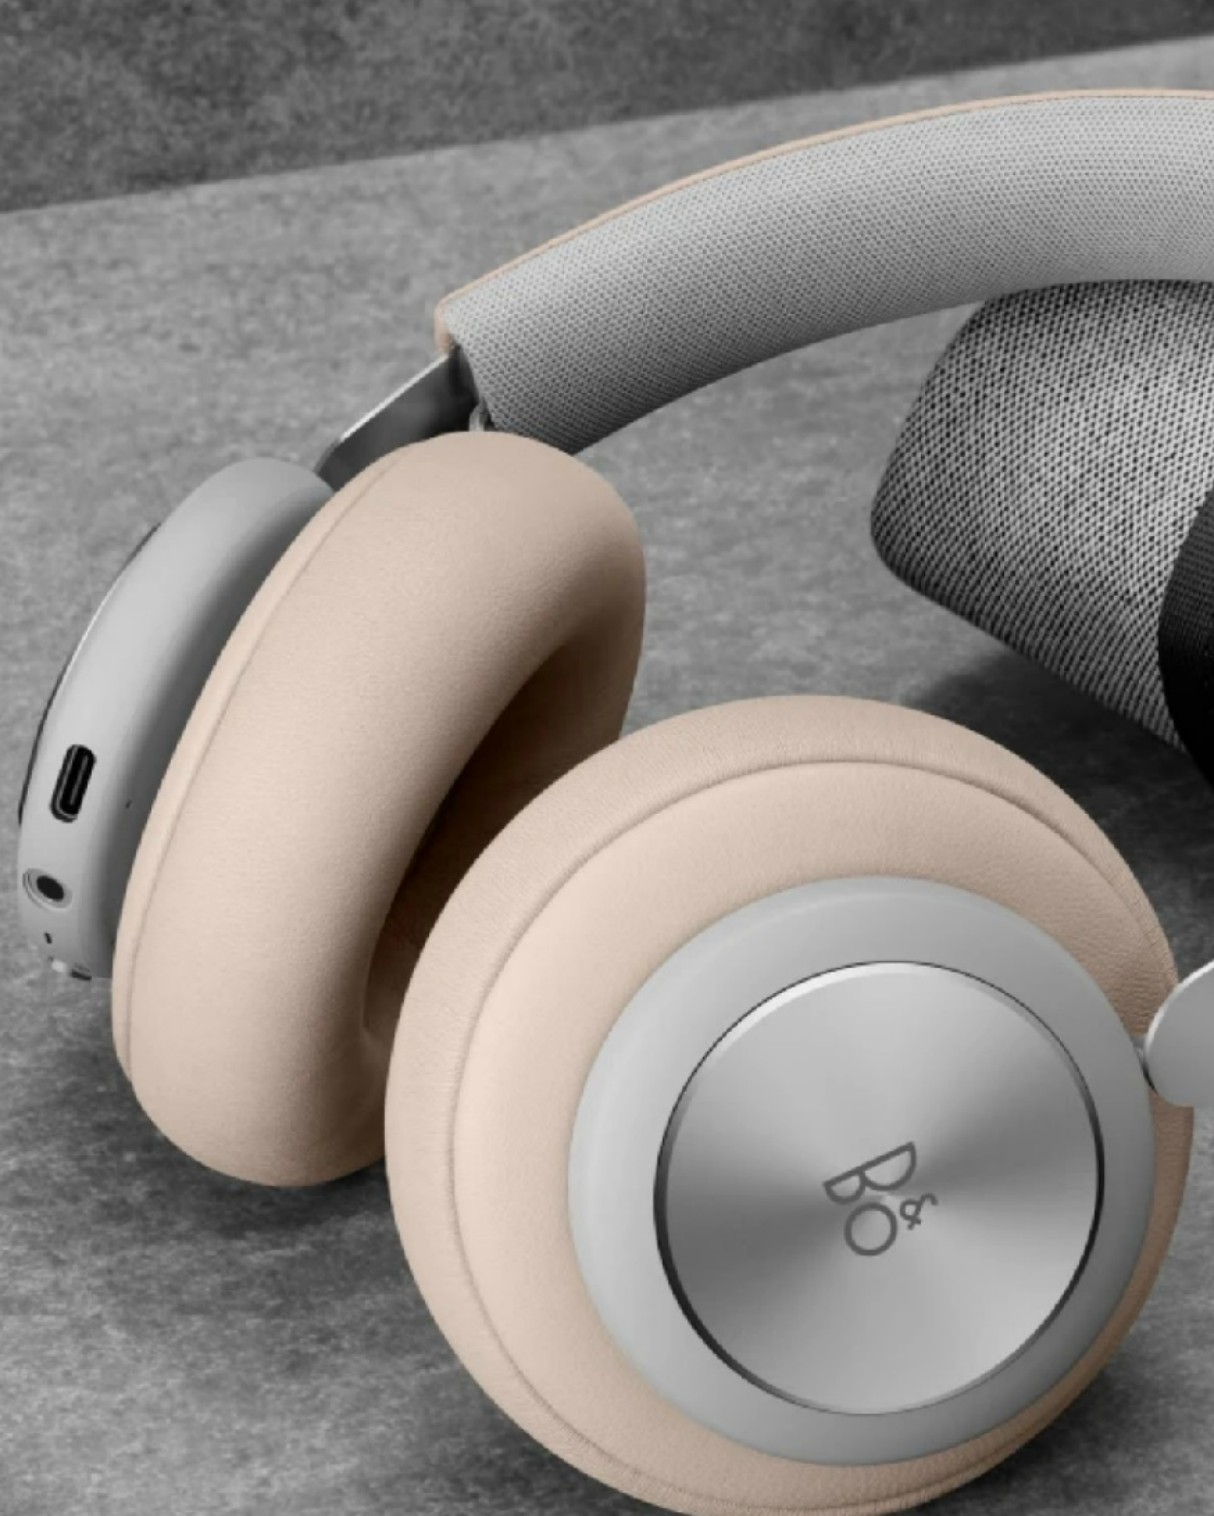 bang-olufsen-beoplay-h4-wireless-headphones-4